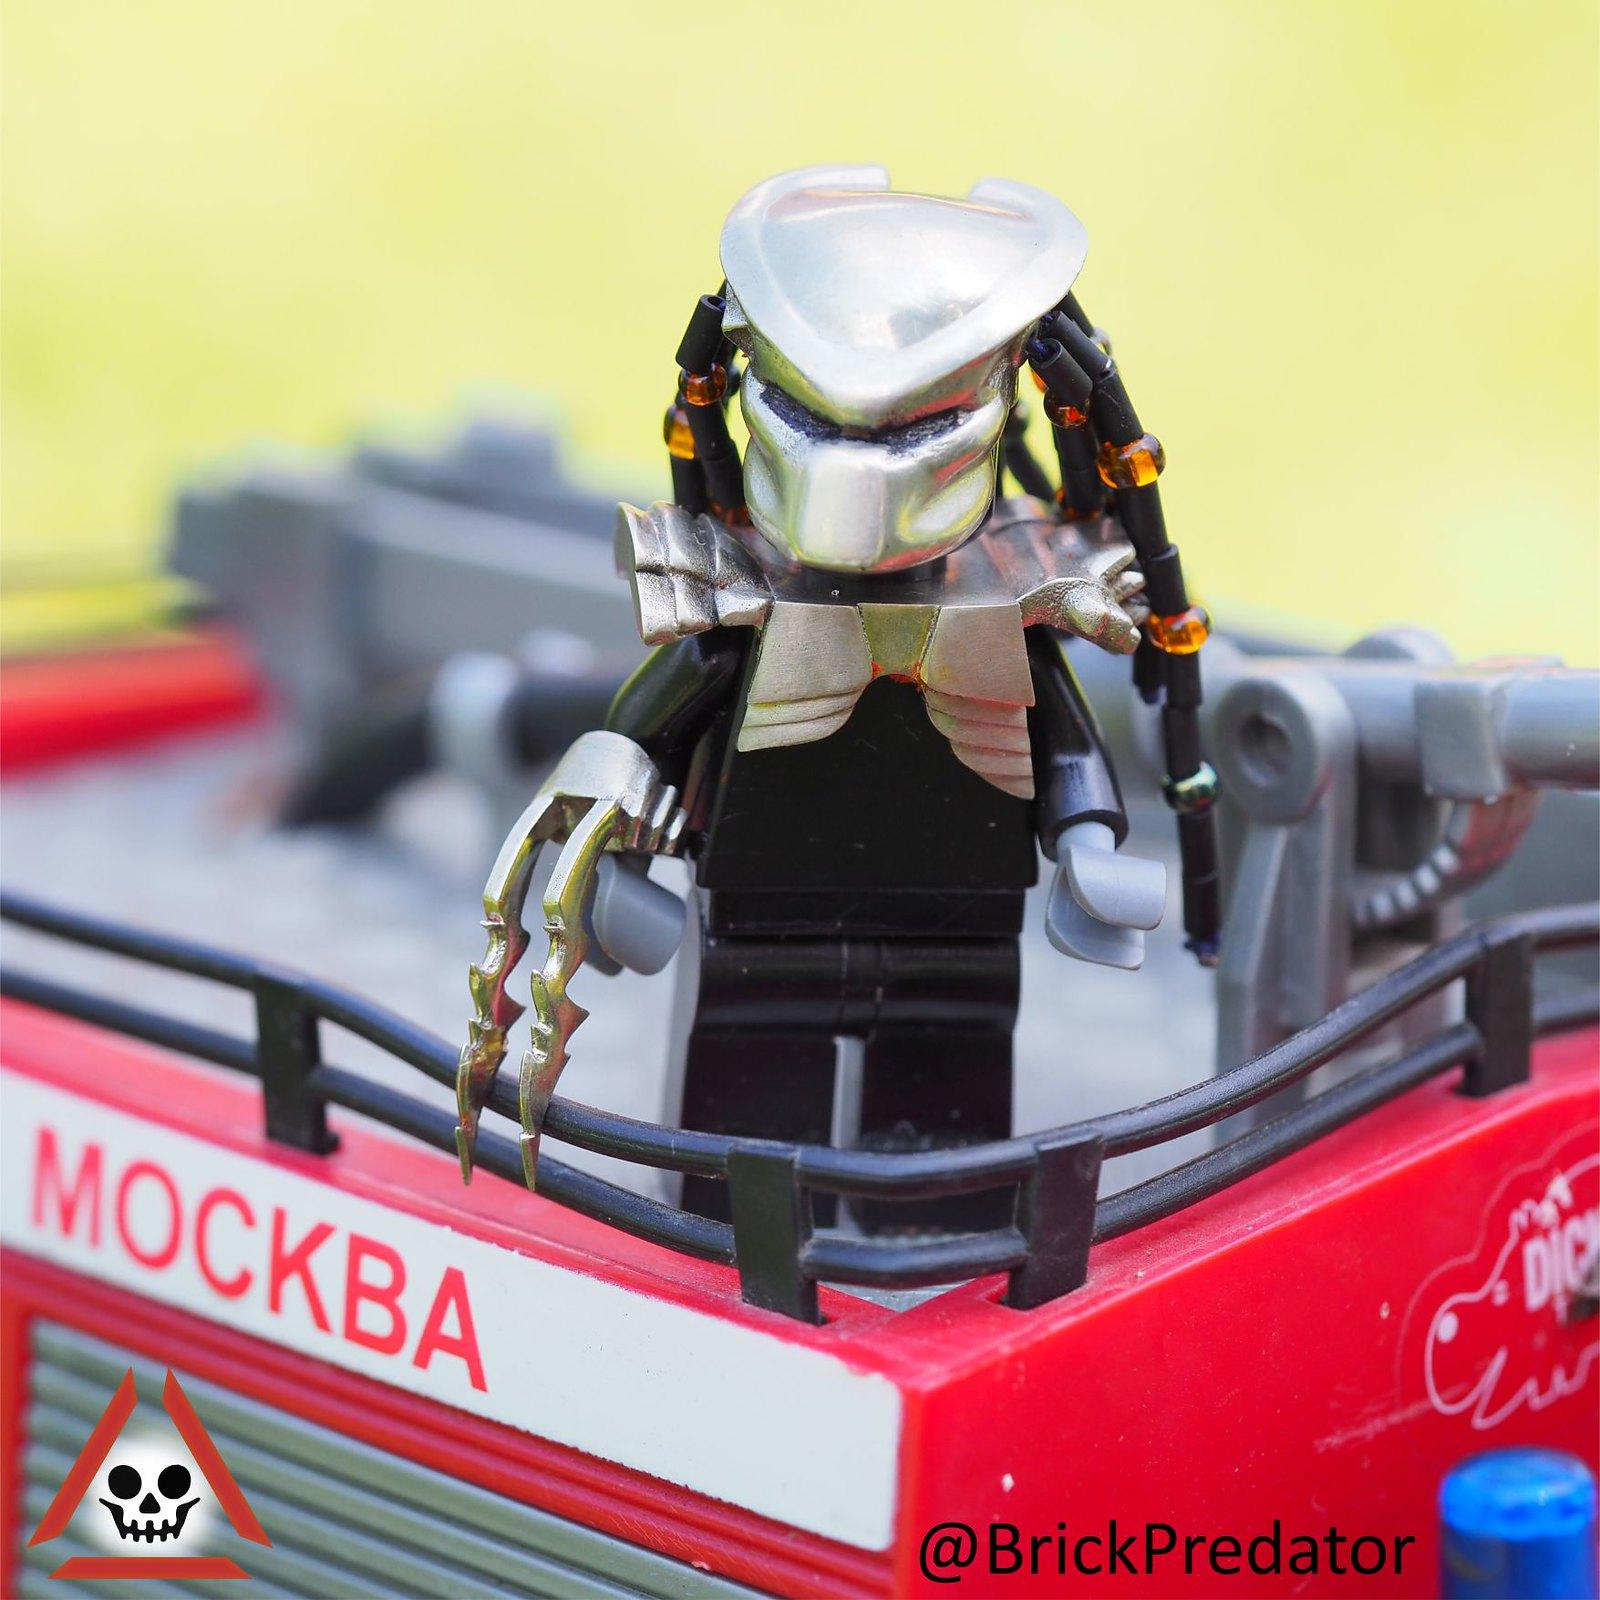 Lego custom minifigure Predator